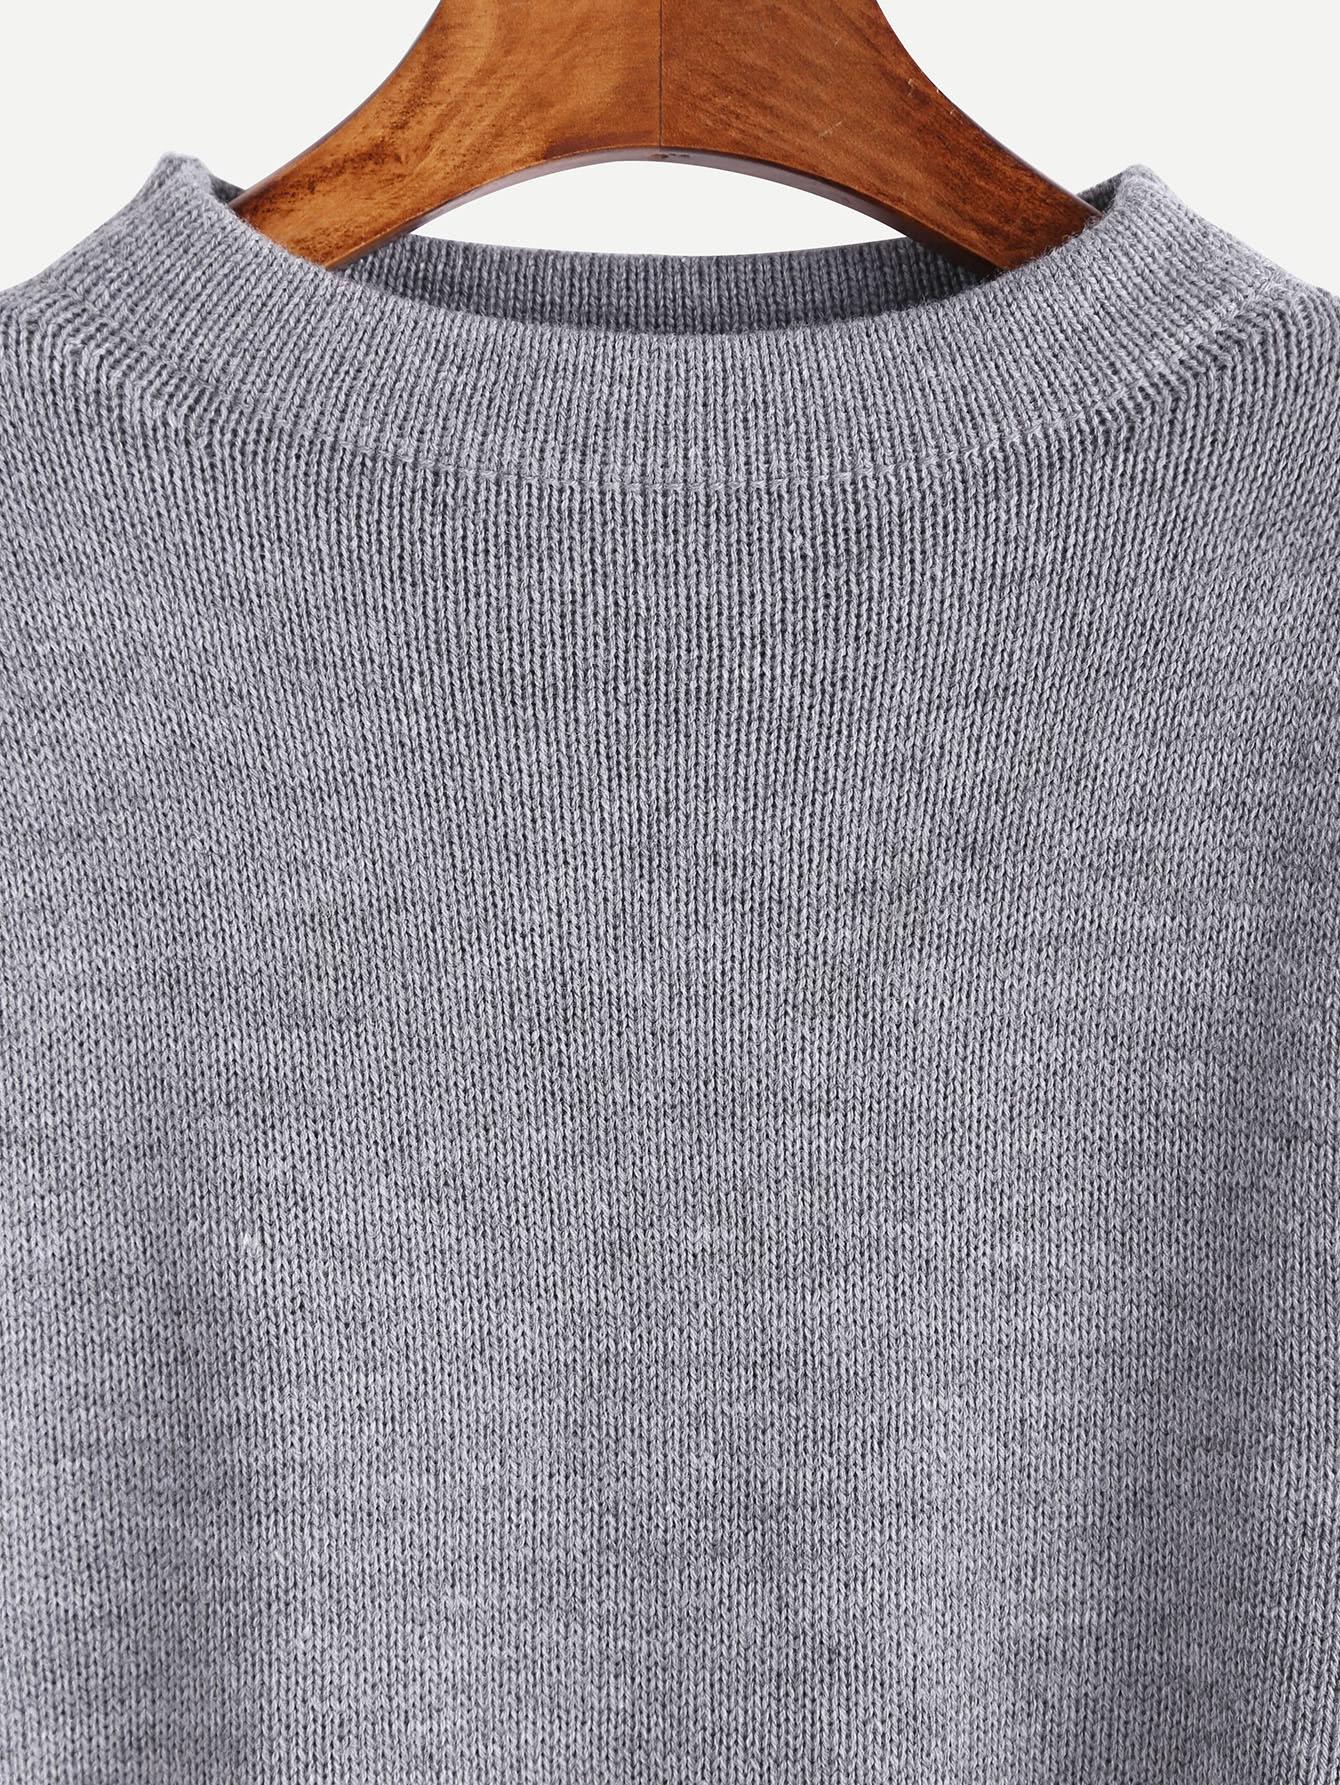 sweater161108451_2